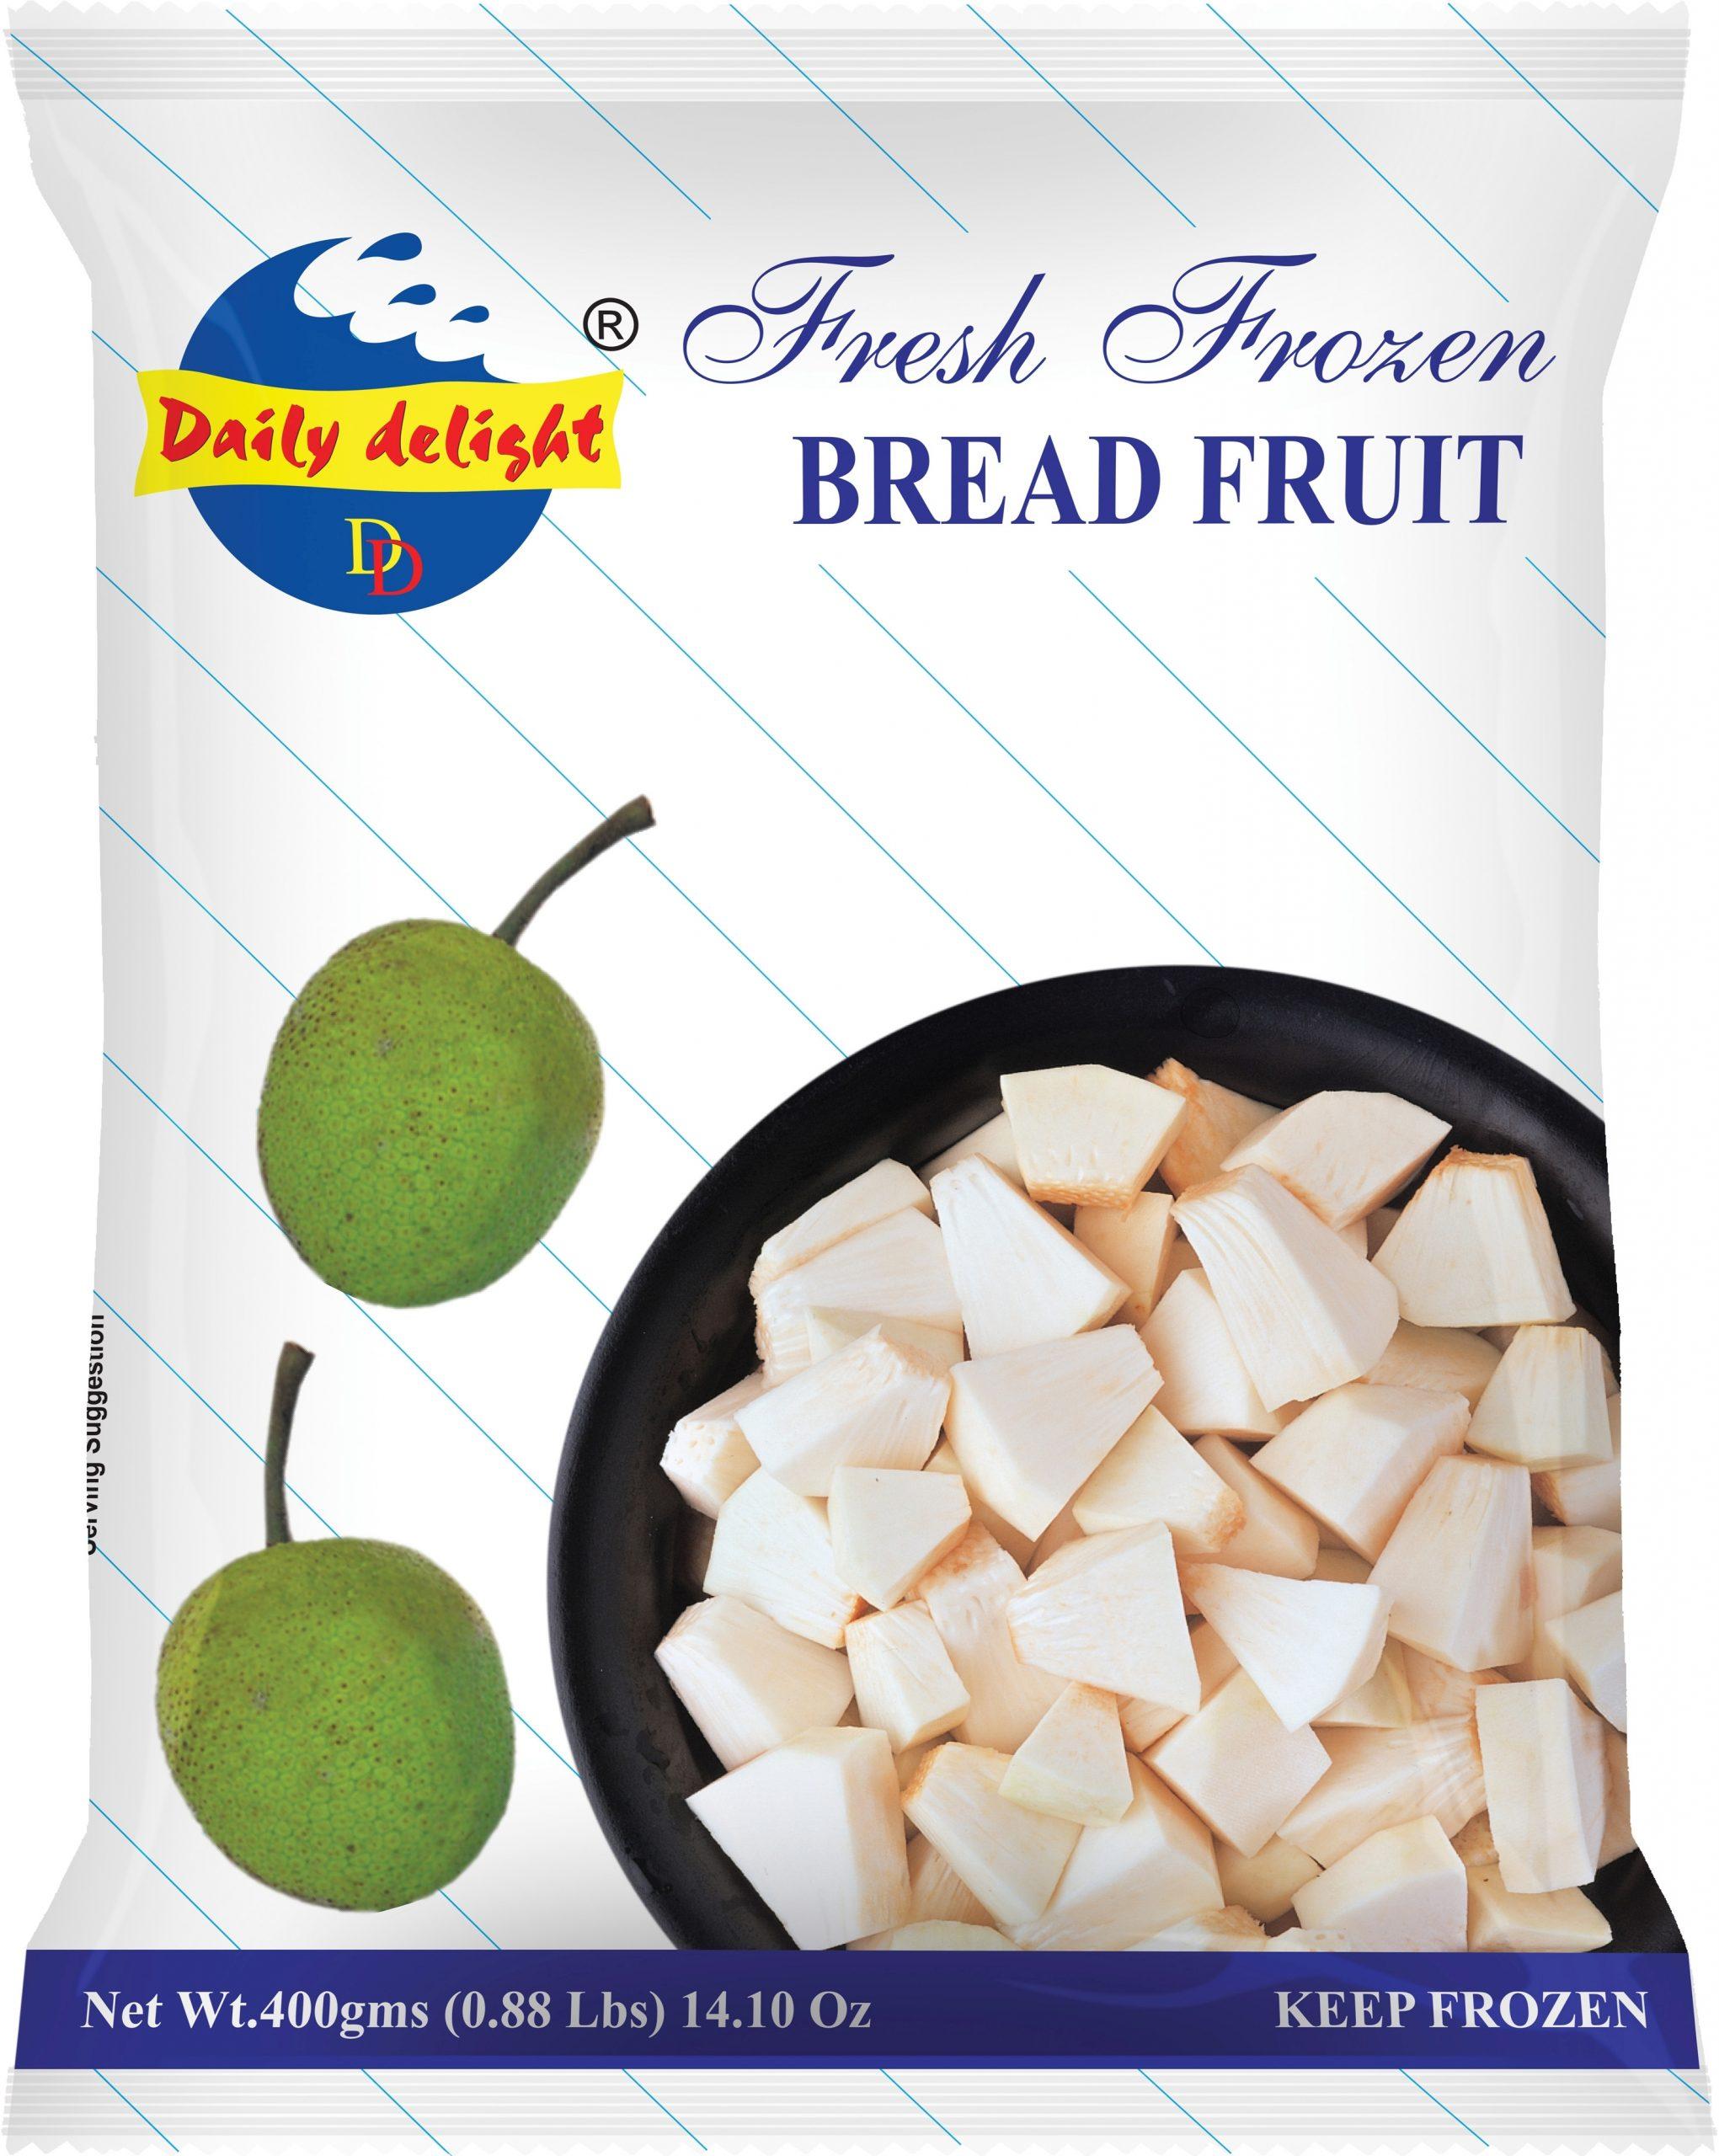 Daily Delight Bread Fruit